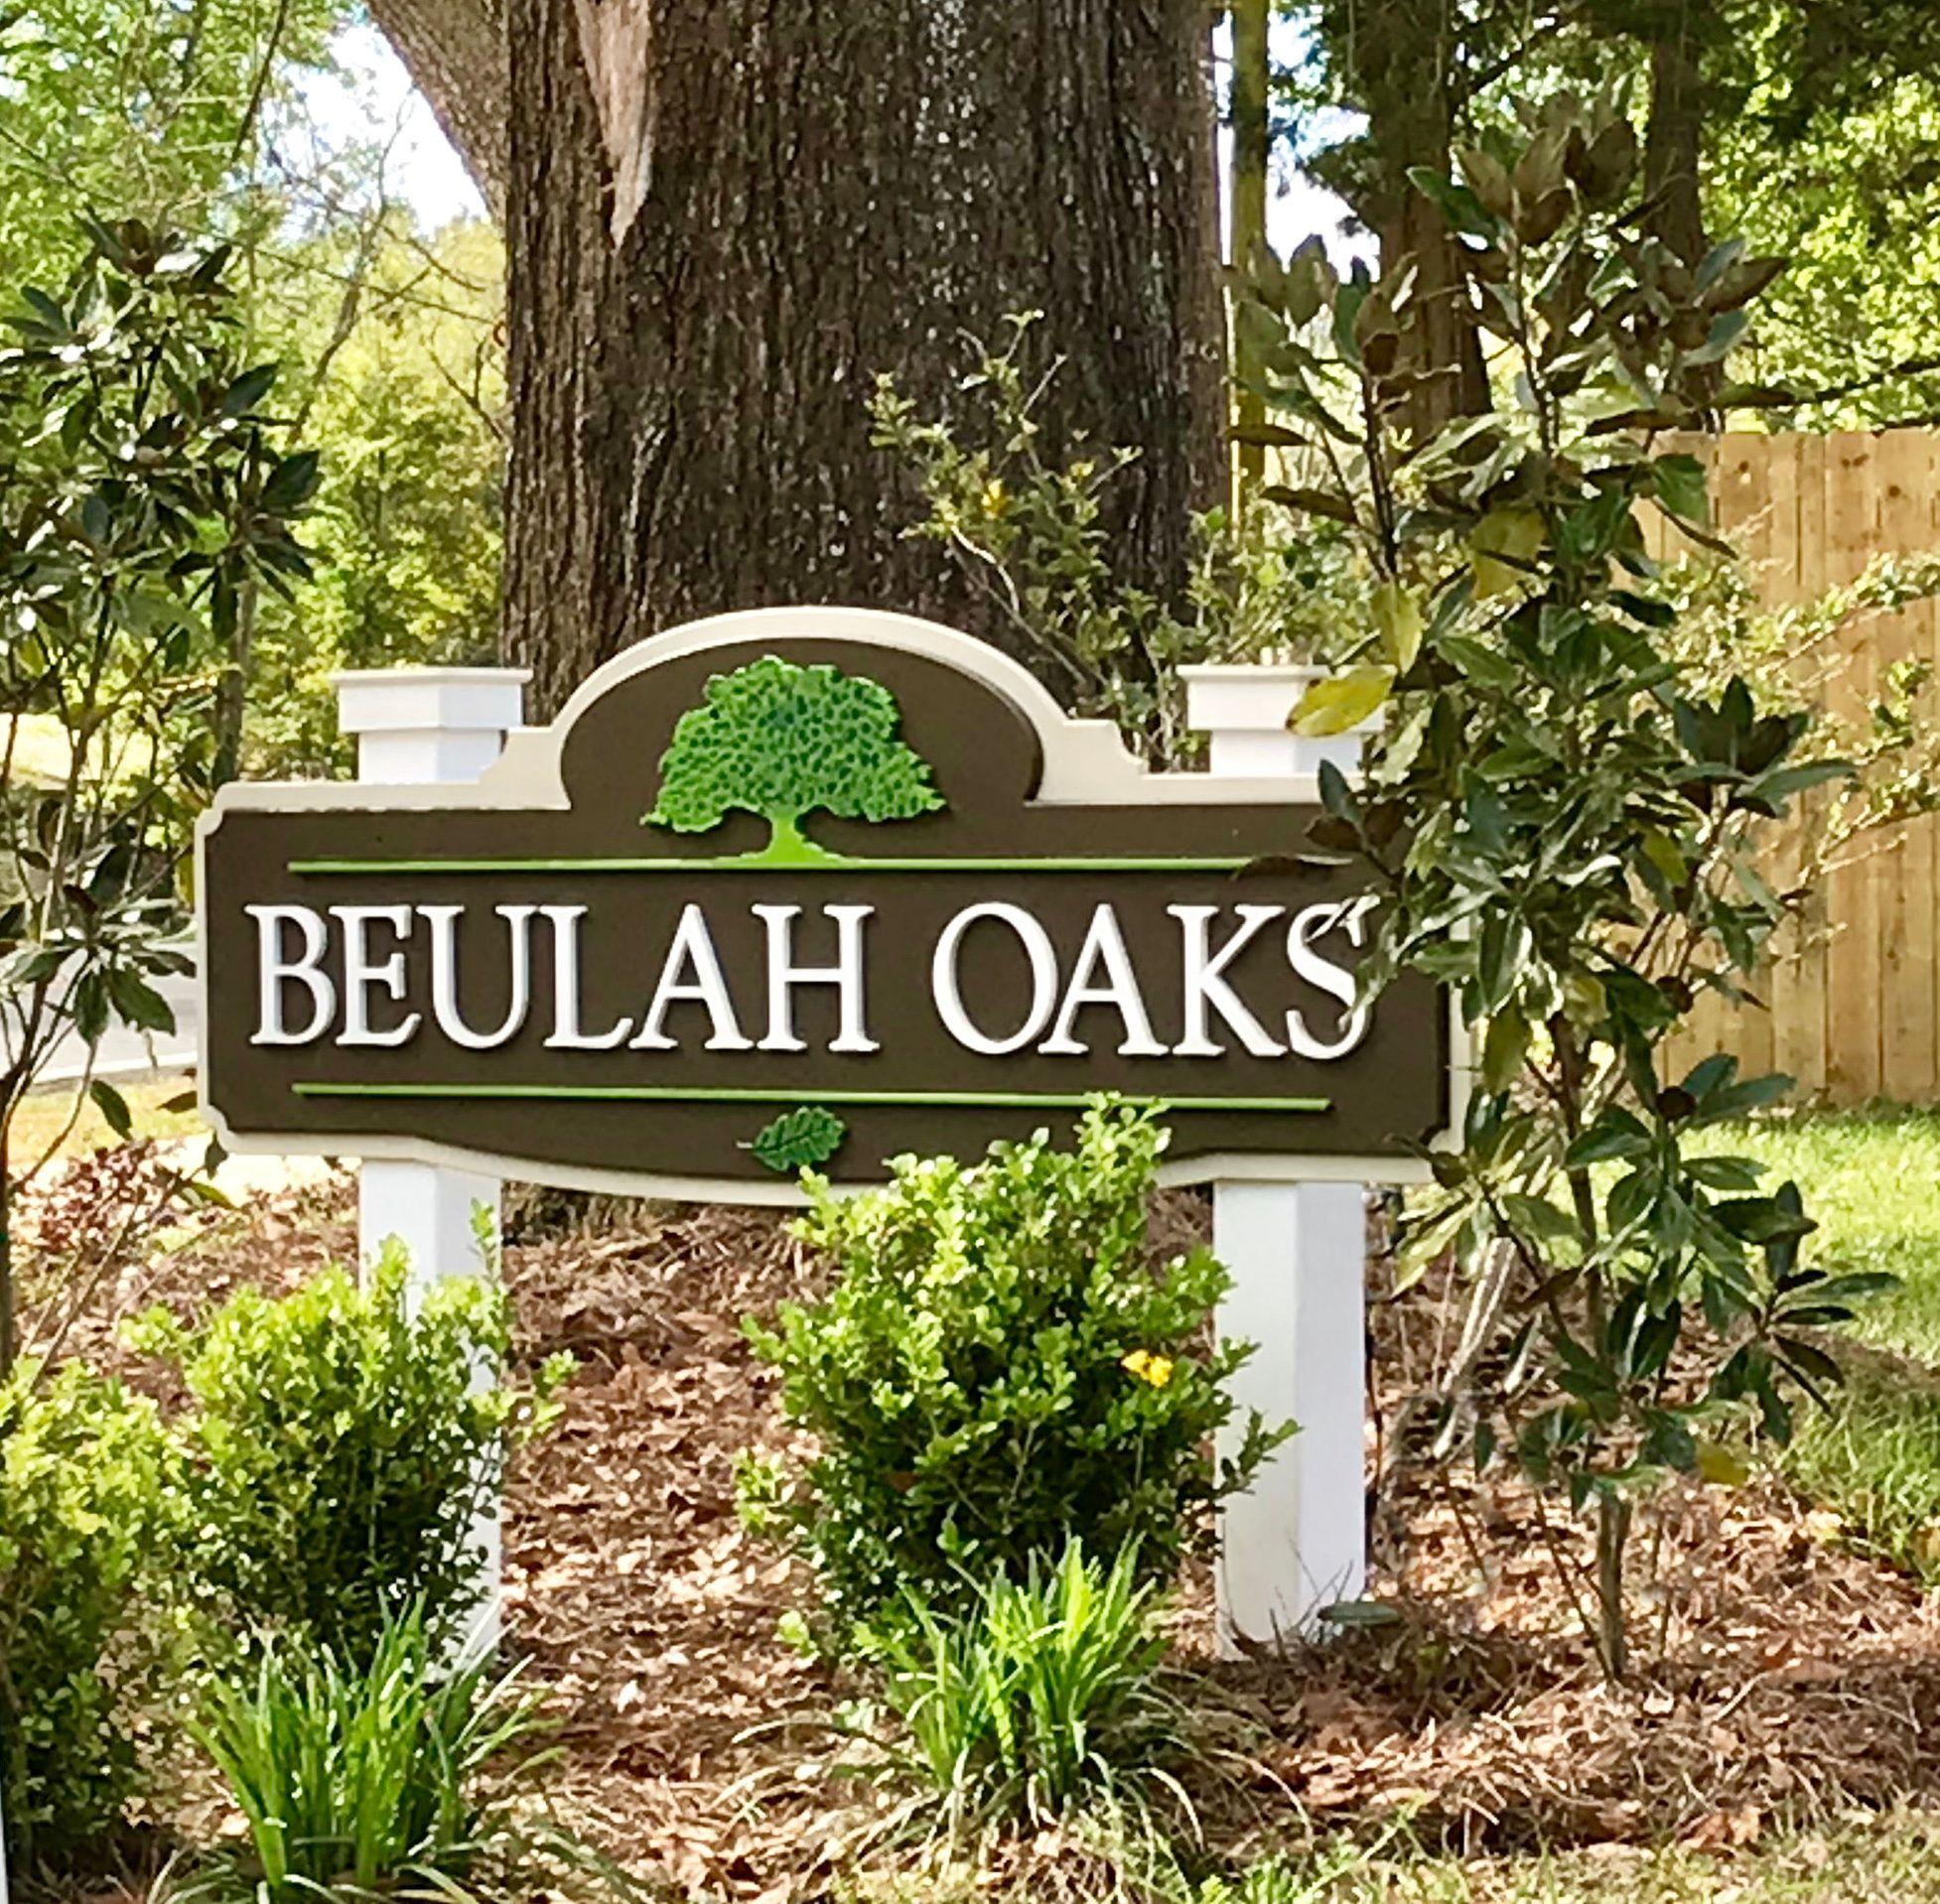 Arbor Oaks Florida: Riverside Arbor Walk In Vernant Park, Alabama